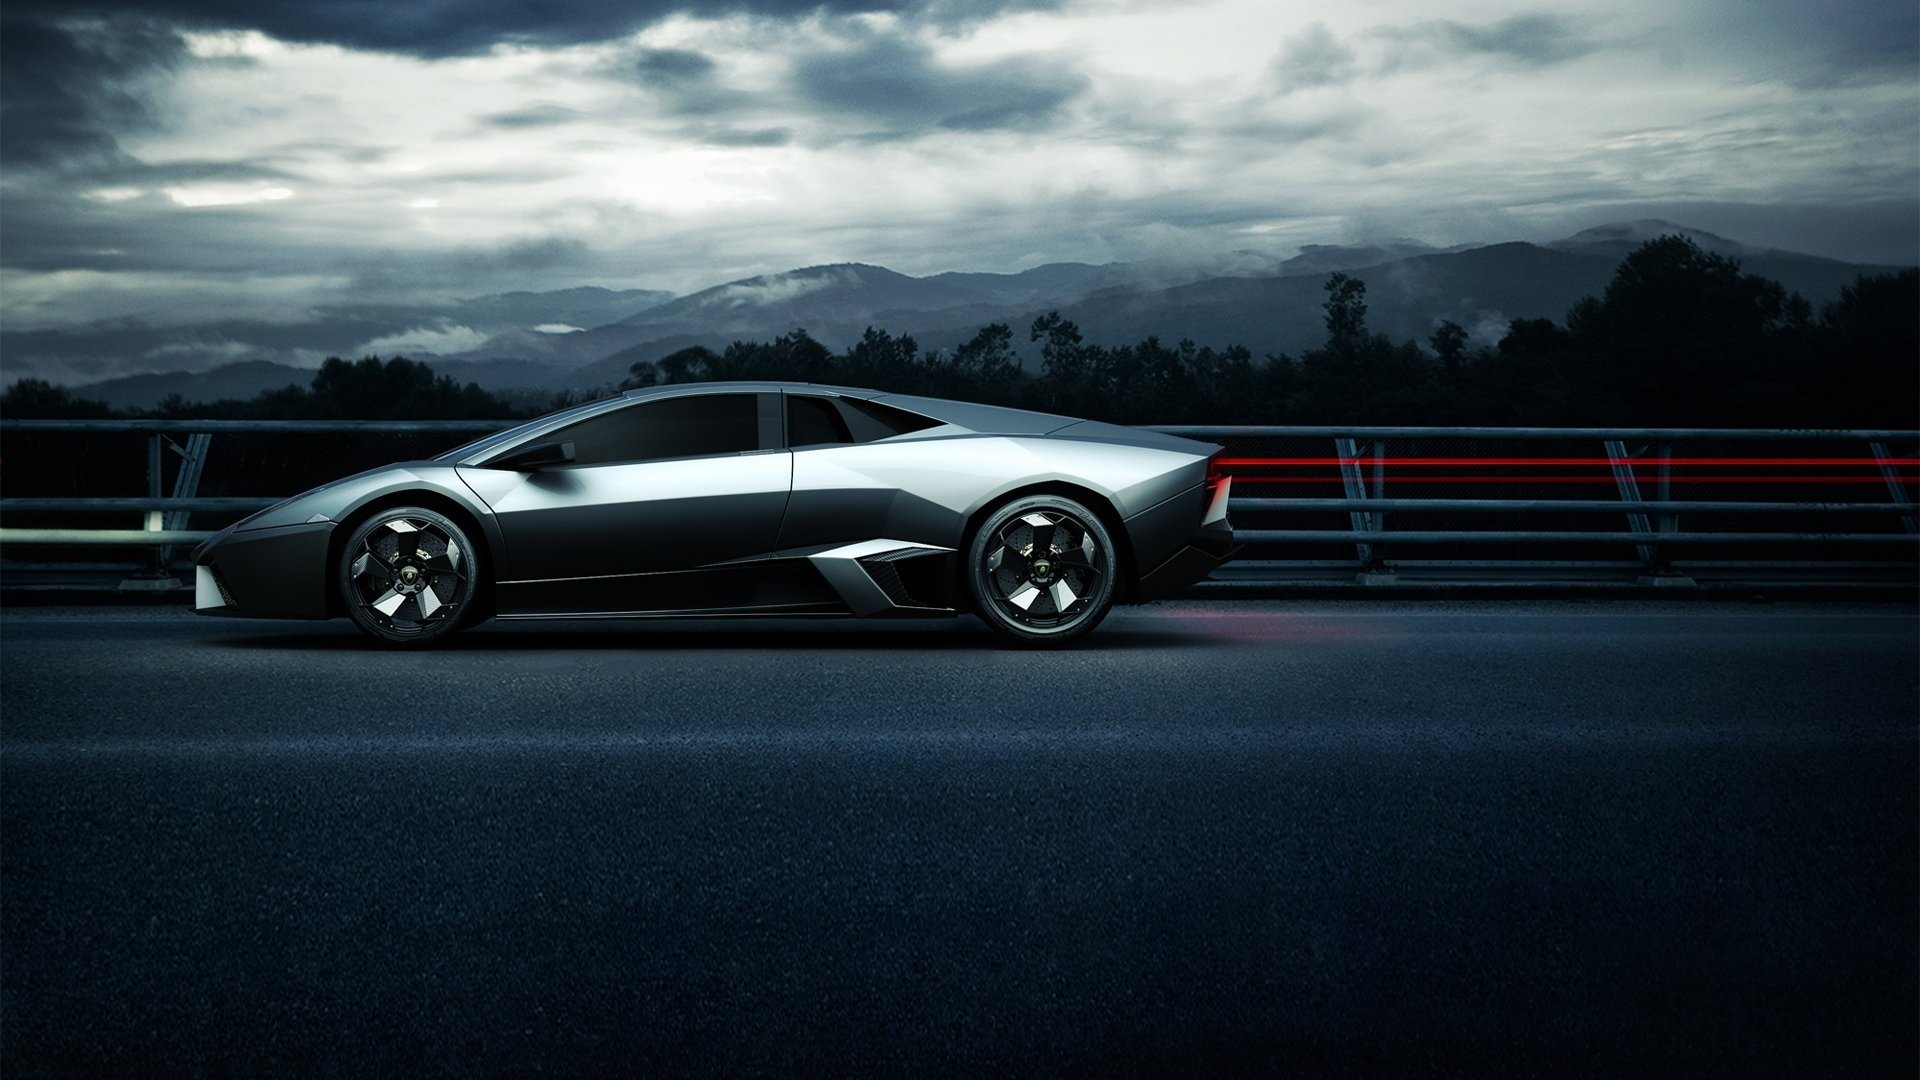 Lamborghini Reventon Wallpaper 1920x1080